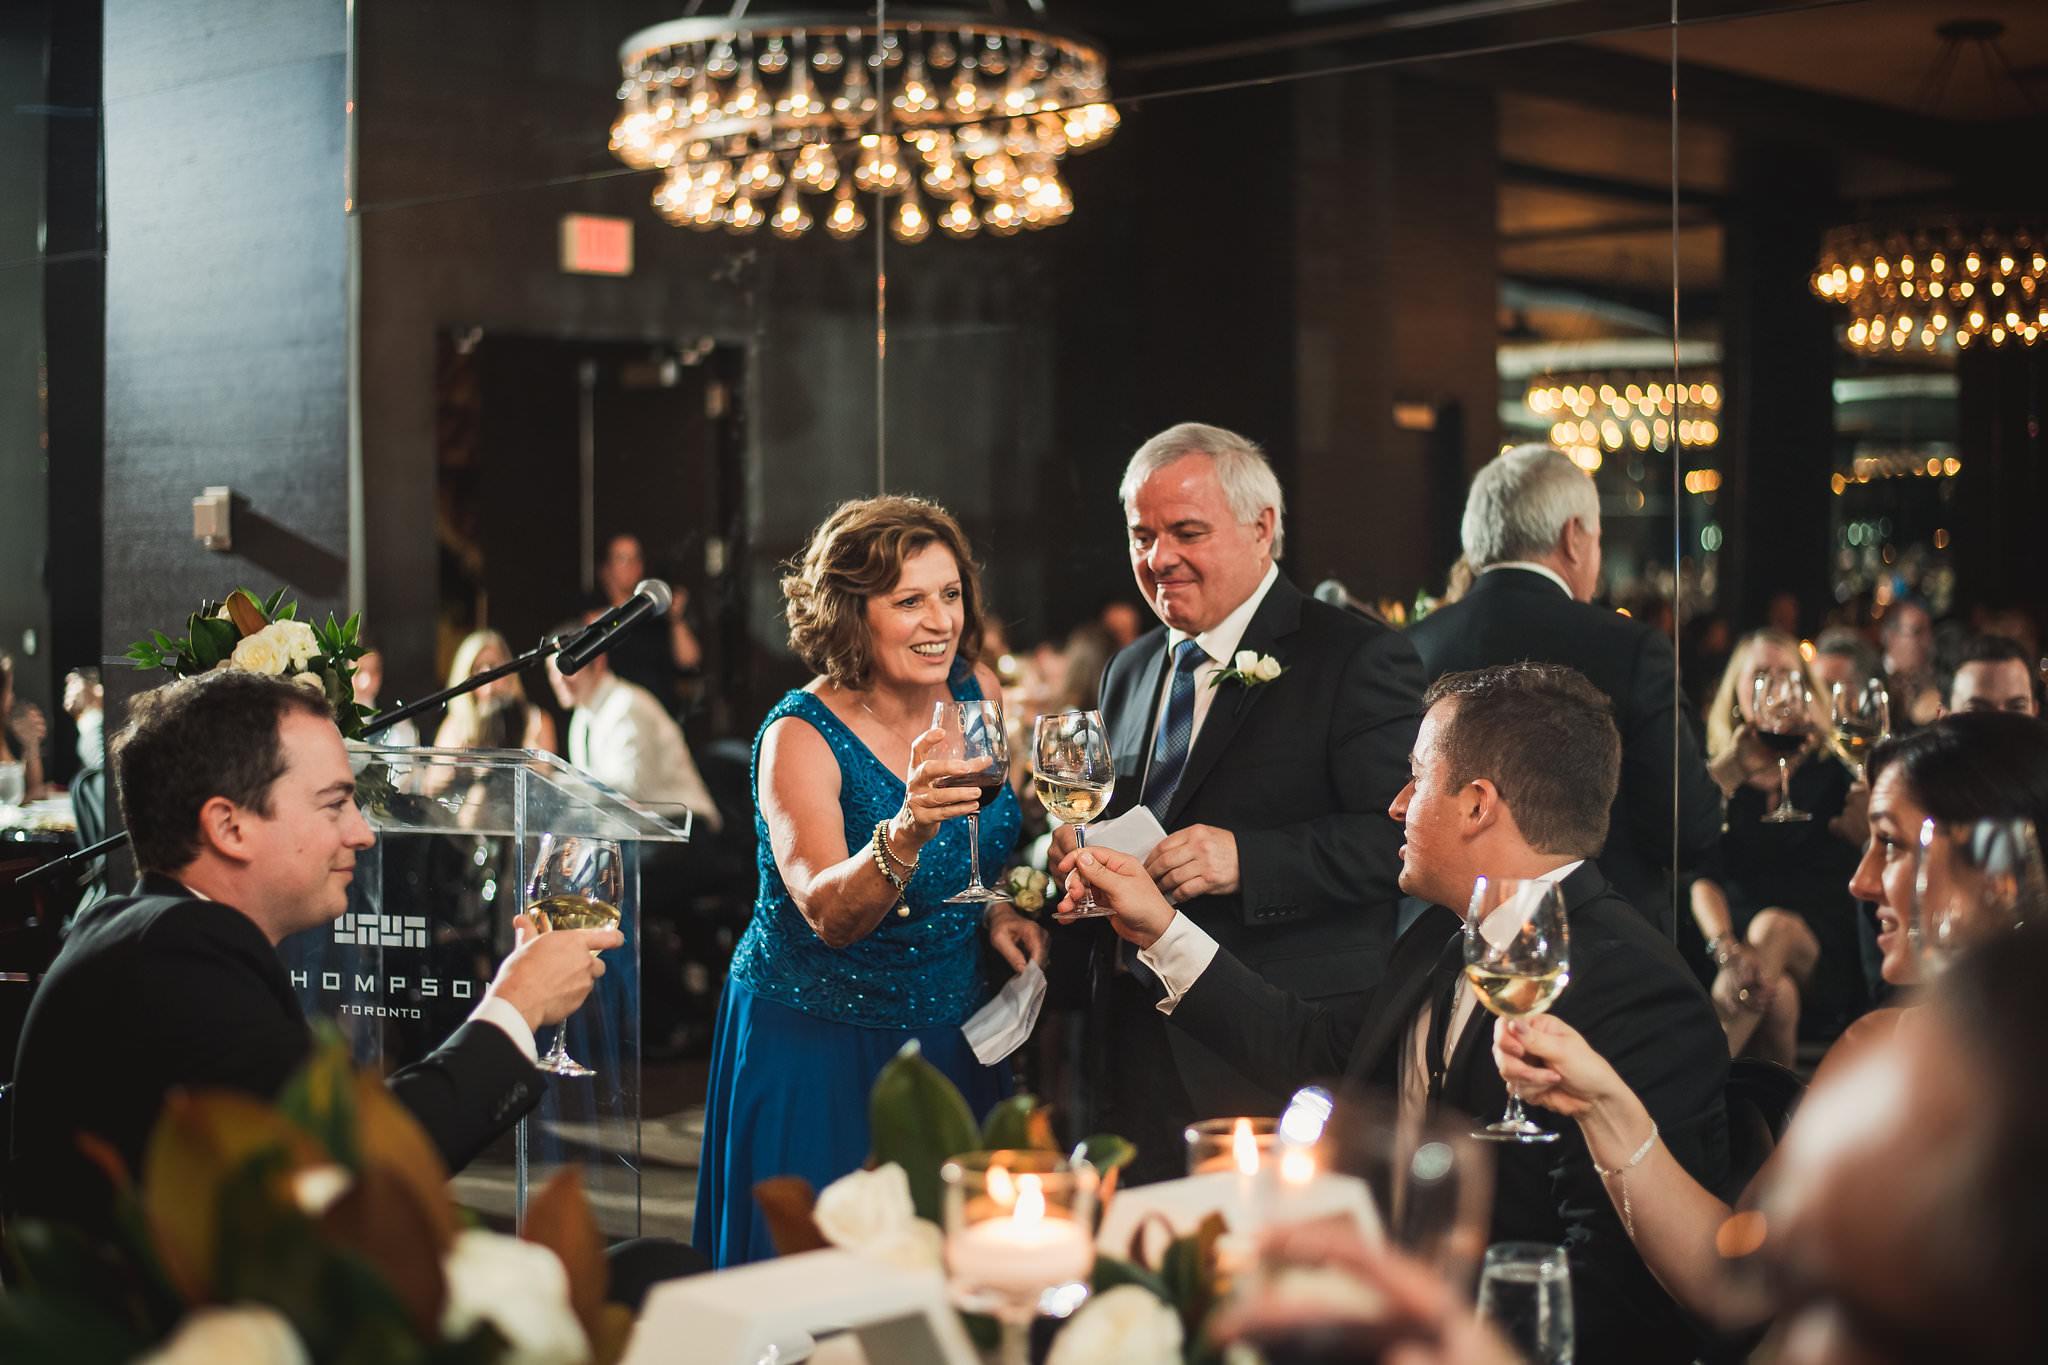 Cristin Rob Thompson Hotel Wedding Photos 639 - Thompson Hotel Wedding Photos